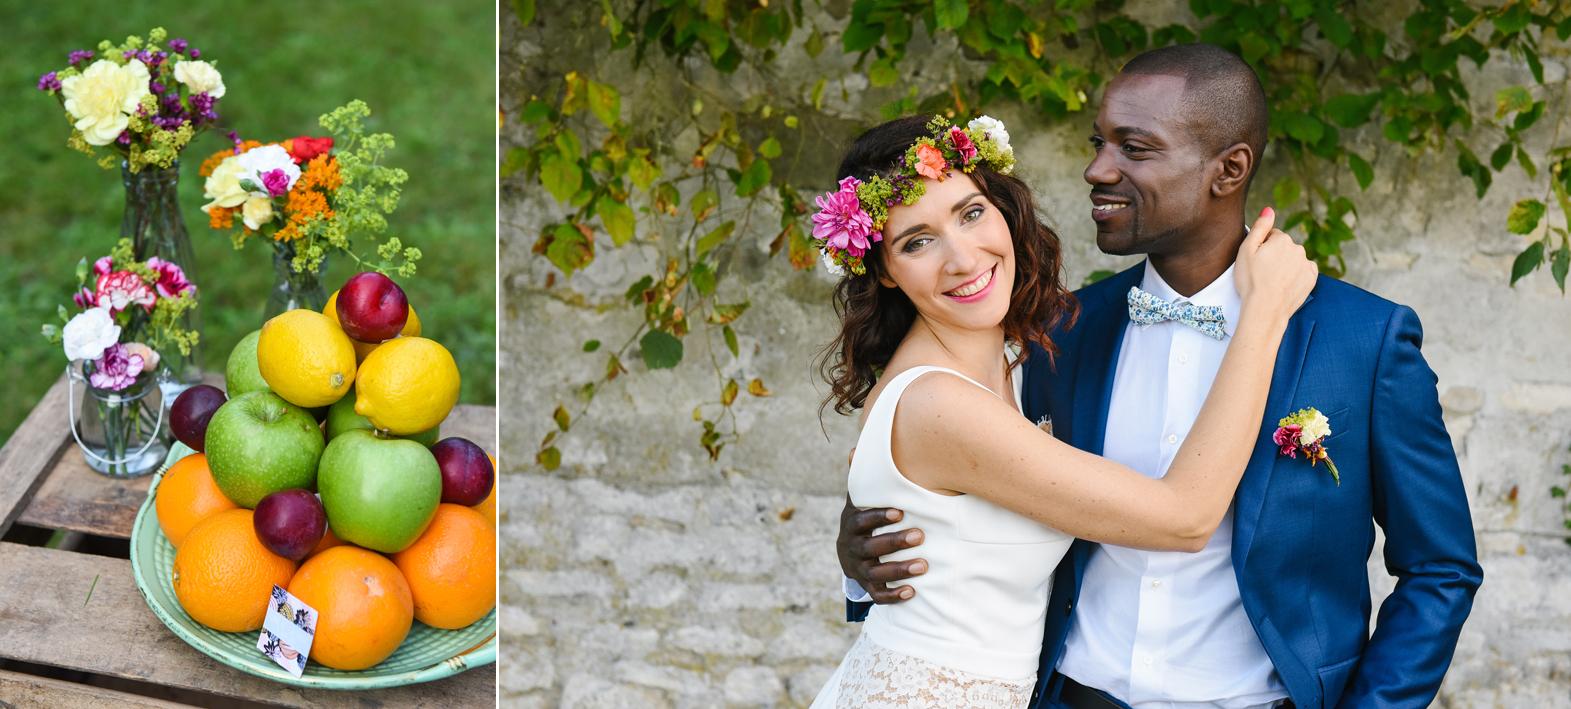 shooting_inspiration_mariage_peps_wedding_95_photographe_clemence_dubois-mep15